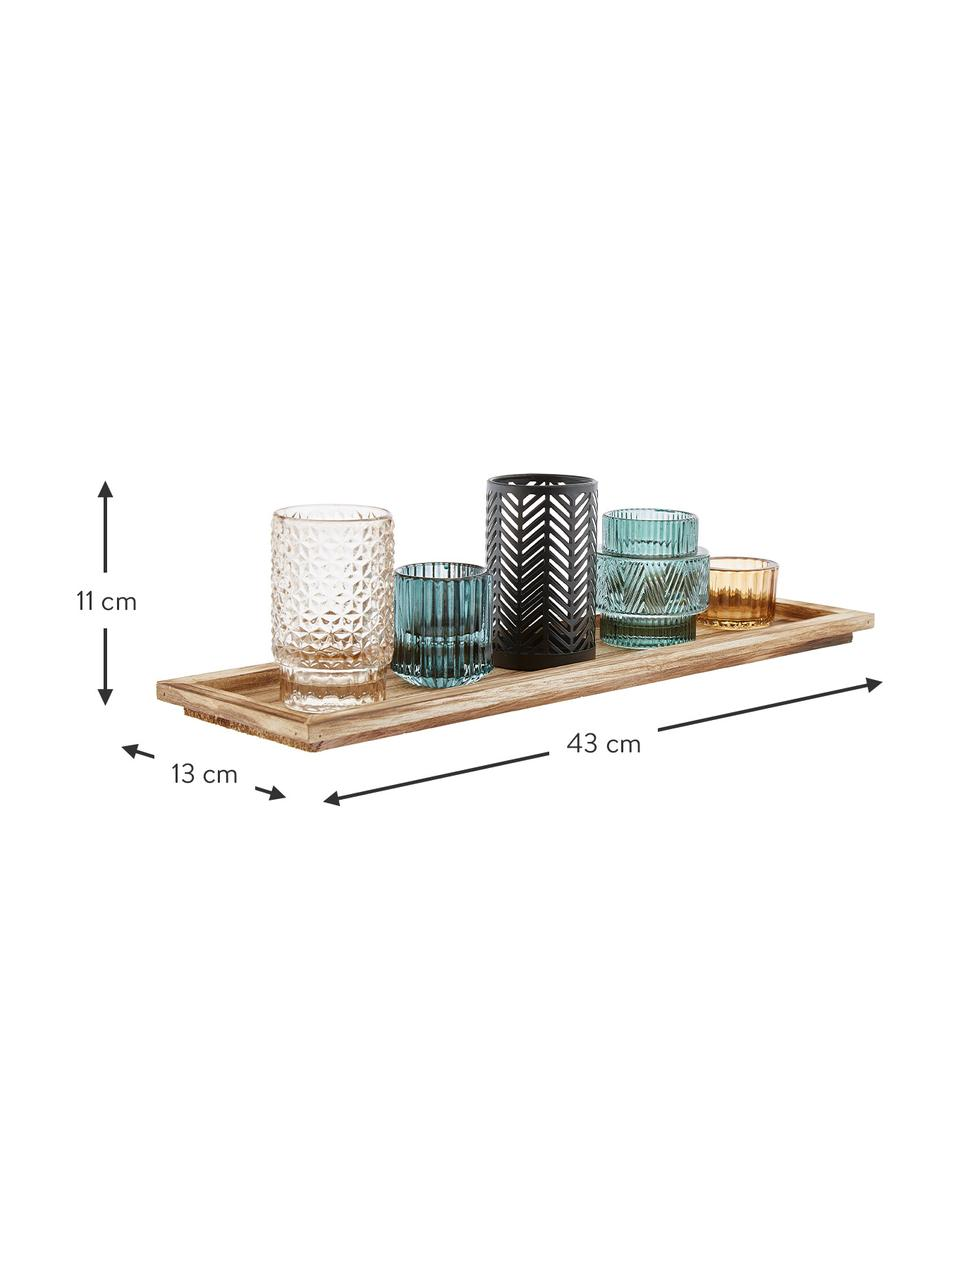 Windlichter-Set Homa, 6-tlg., Tablett: Paulowniaholz, Mehrfarbig, 43 x 11 cm